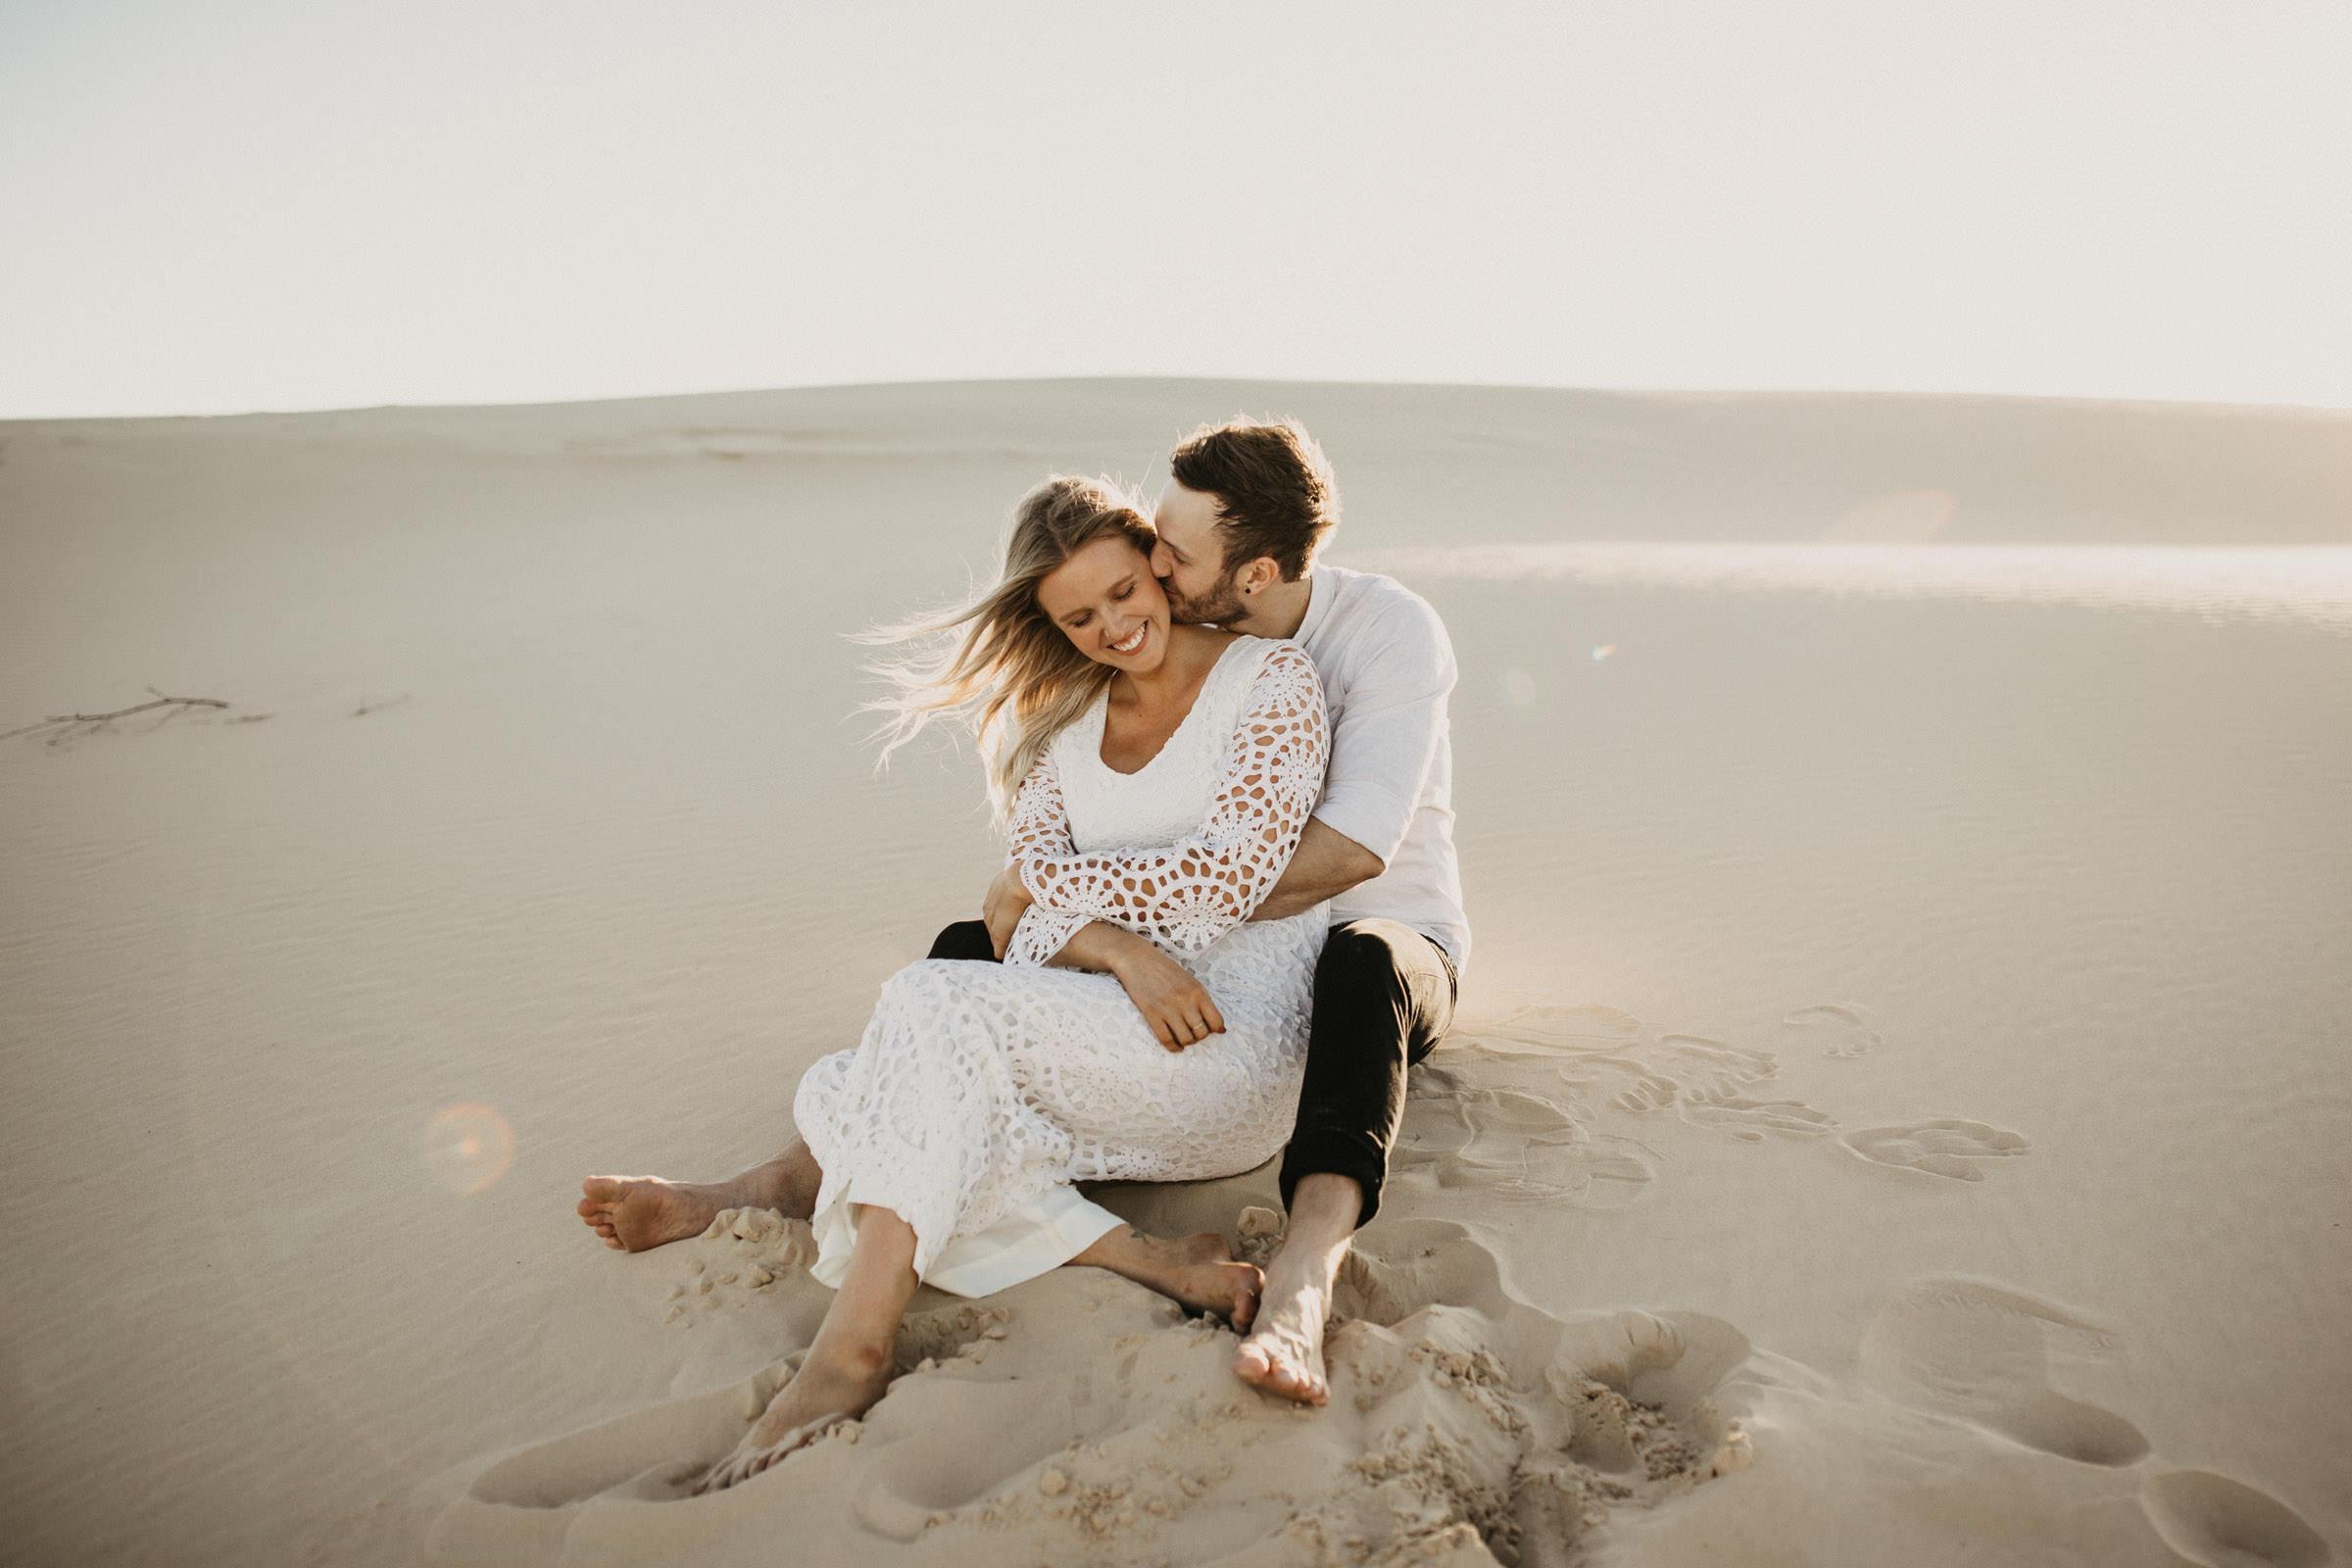 Stockon-sand-dunes-shoot-17.jpg